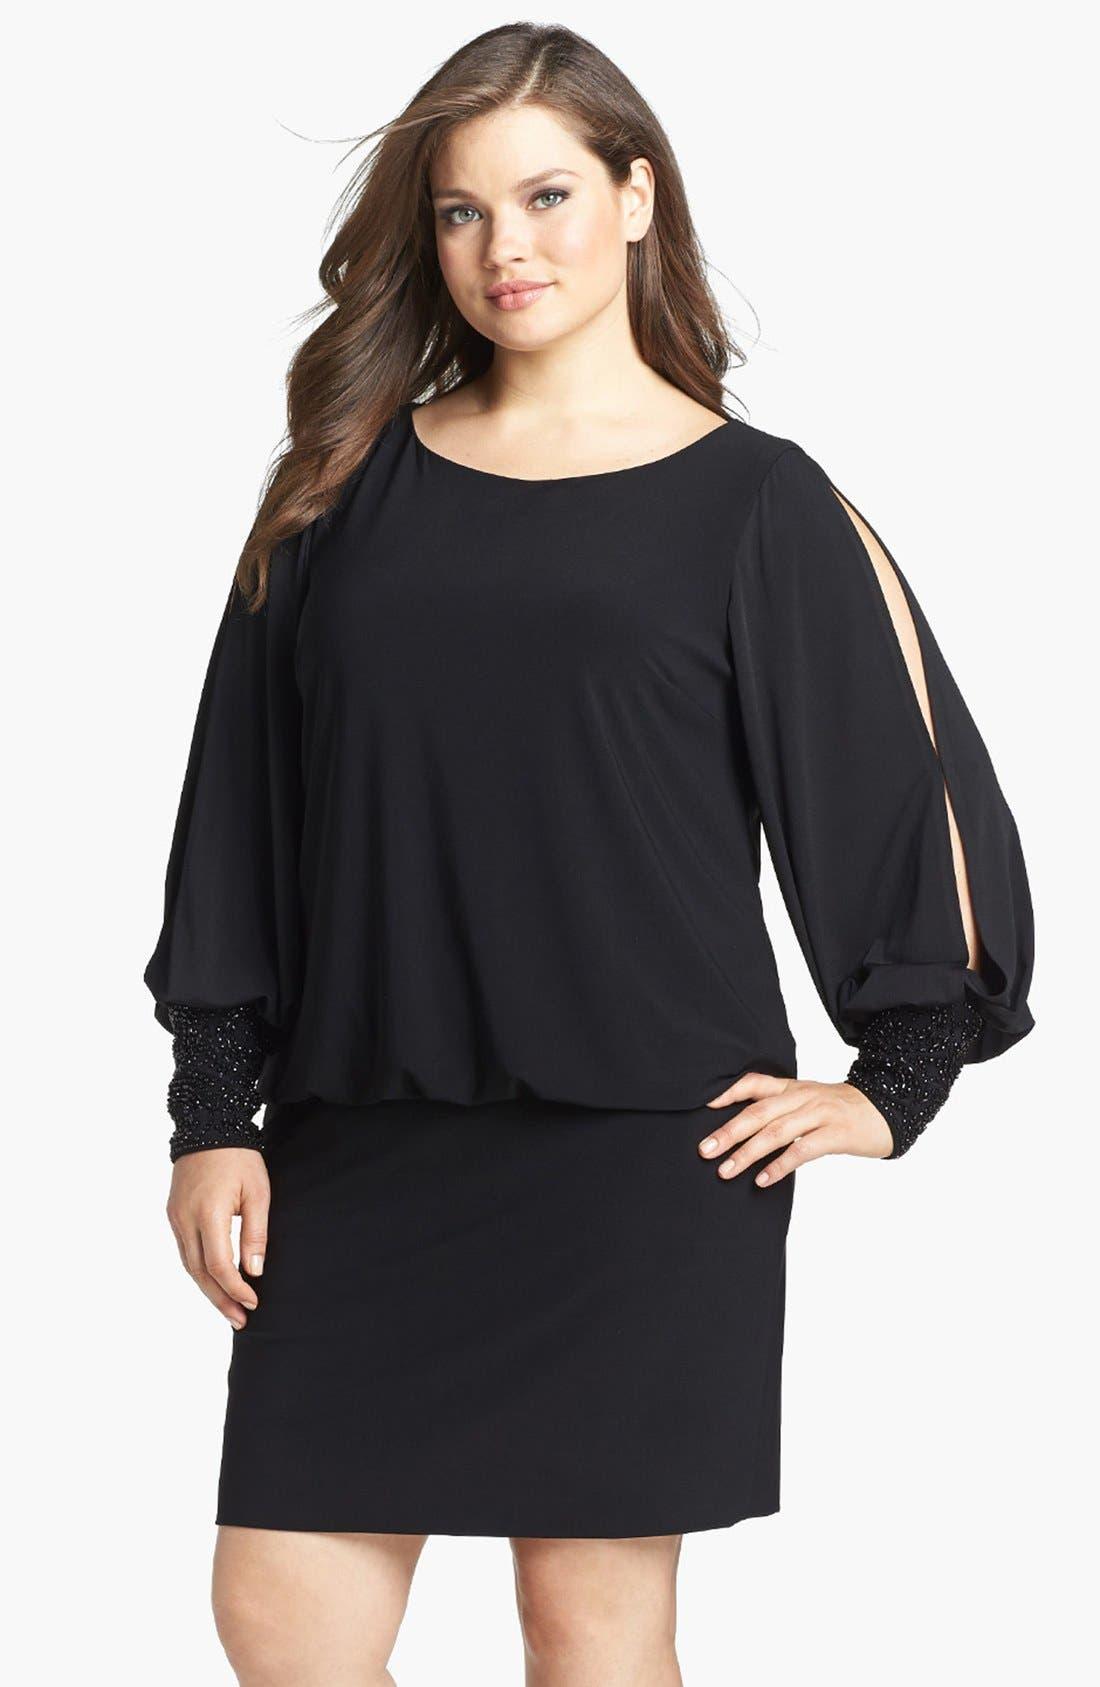 XSCAPE Embellished Cuff Blouson Jersey Dress